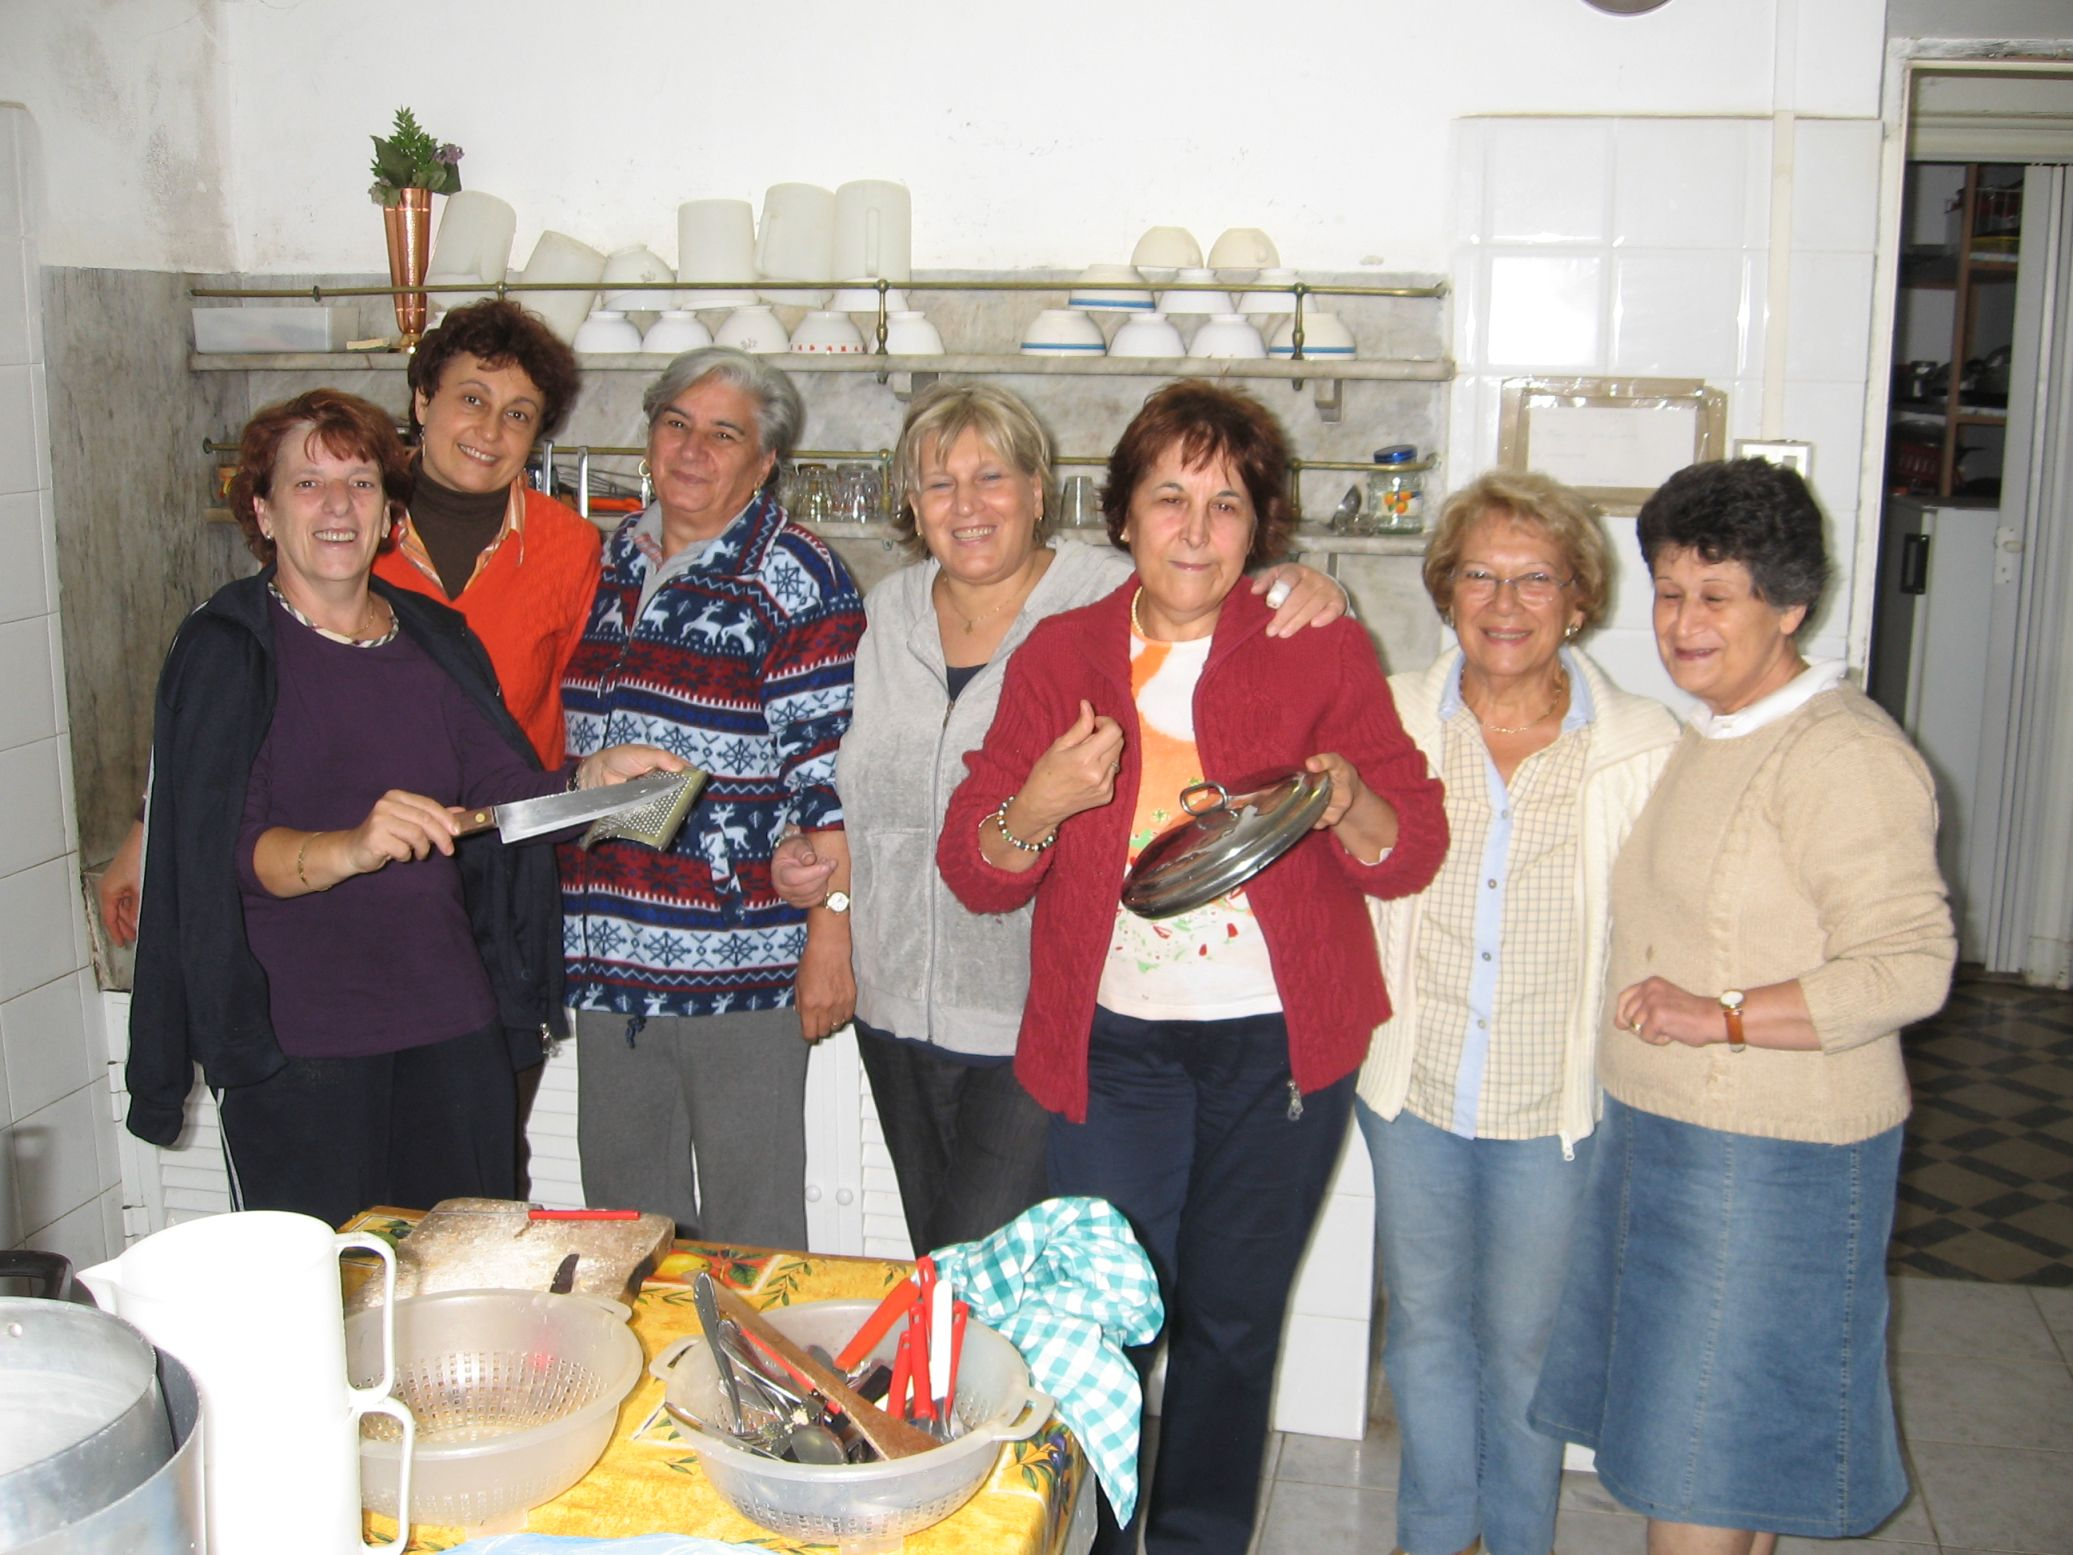 Bivacco_Persone_Impegnate_Torriglia-2009-09-19--21.49.03